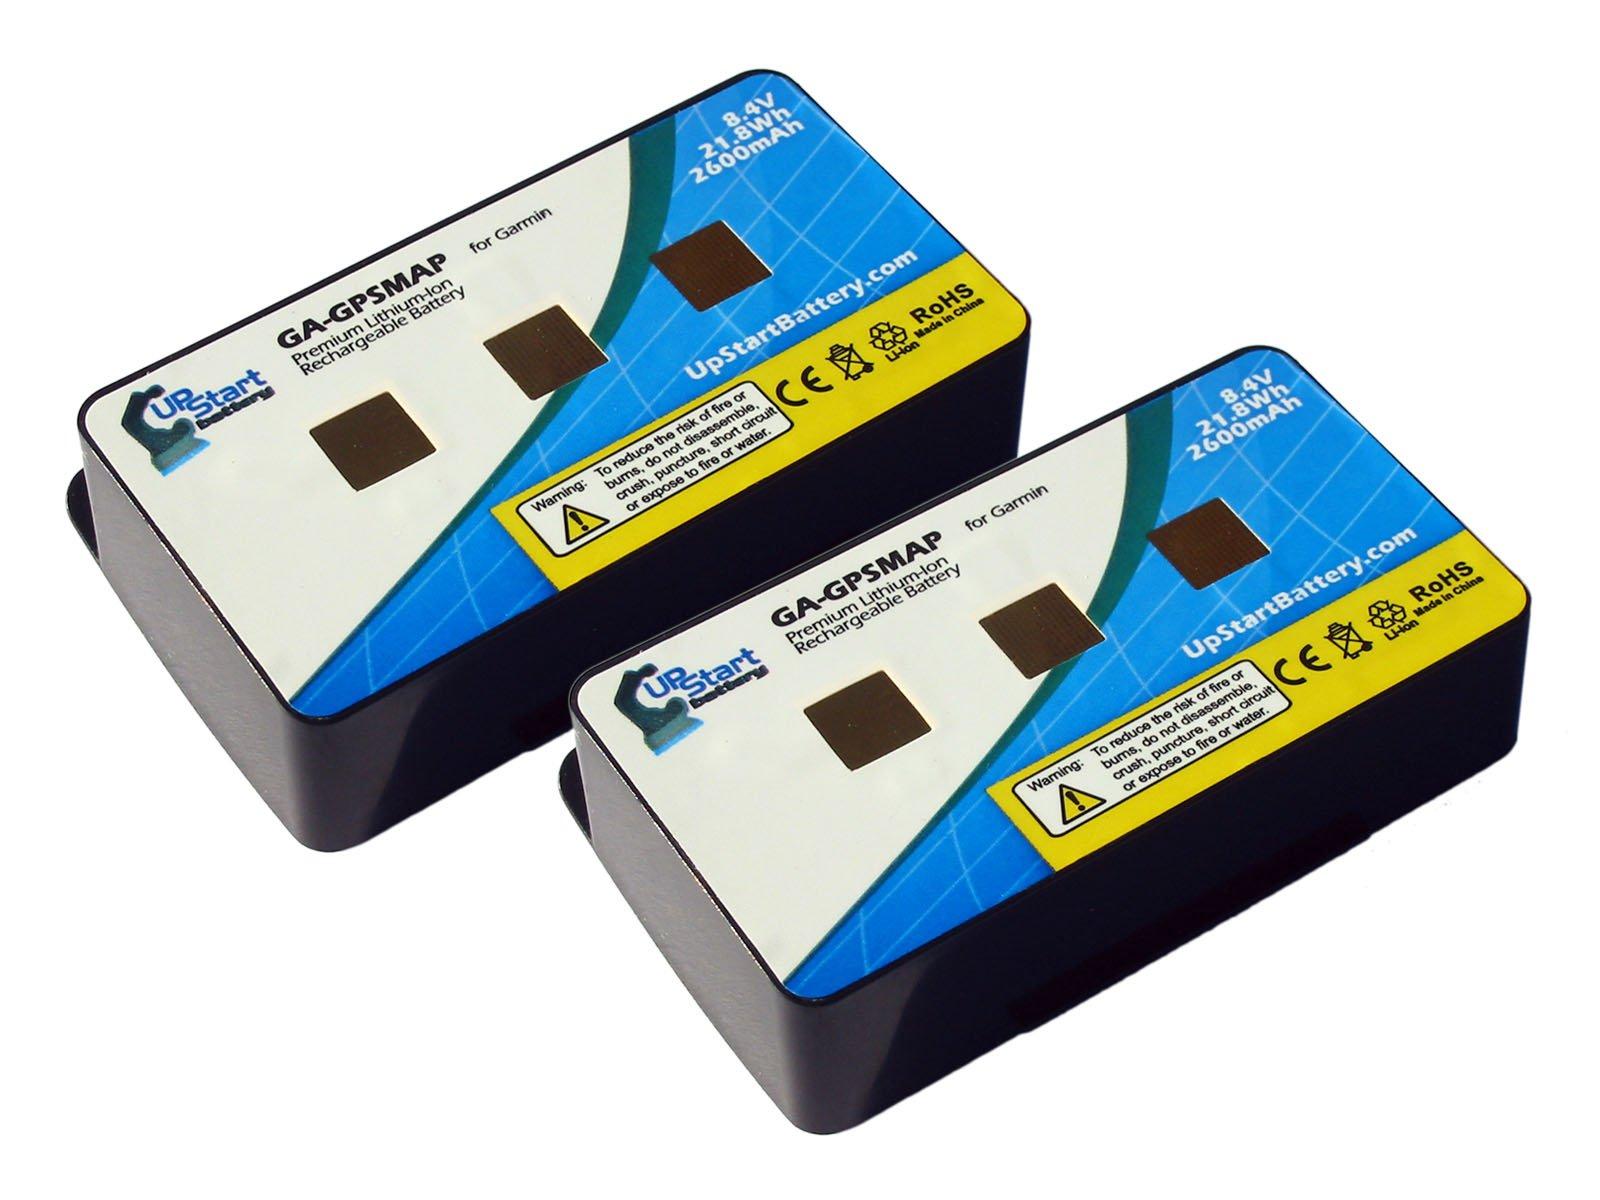 UpStart Battery 2X Pack - 010-10517-01 Replacement Battery for Garmin GPSmap 276, 276c, 296, 376, 376c, 378, 396, 478, 495, 496 Navigators Brand with by UpStart Battery